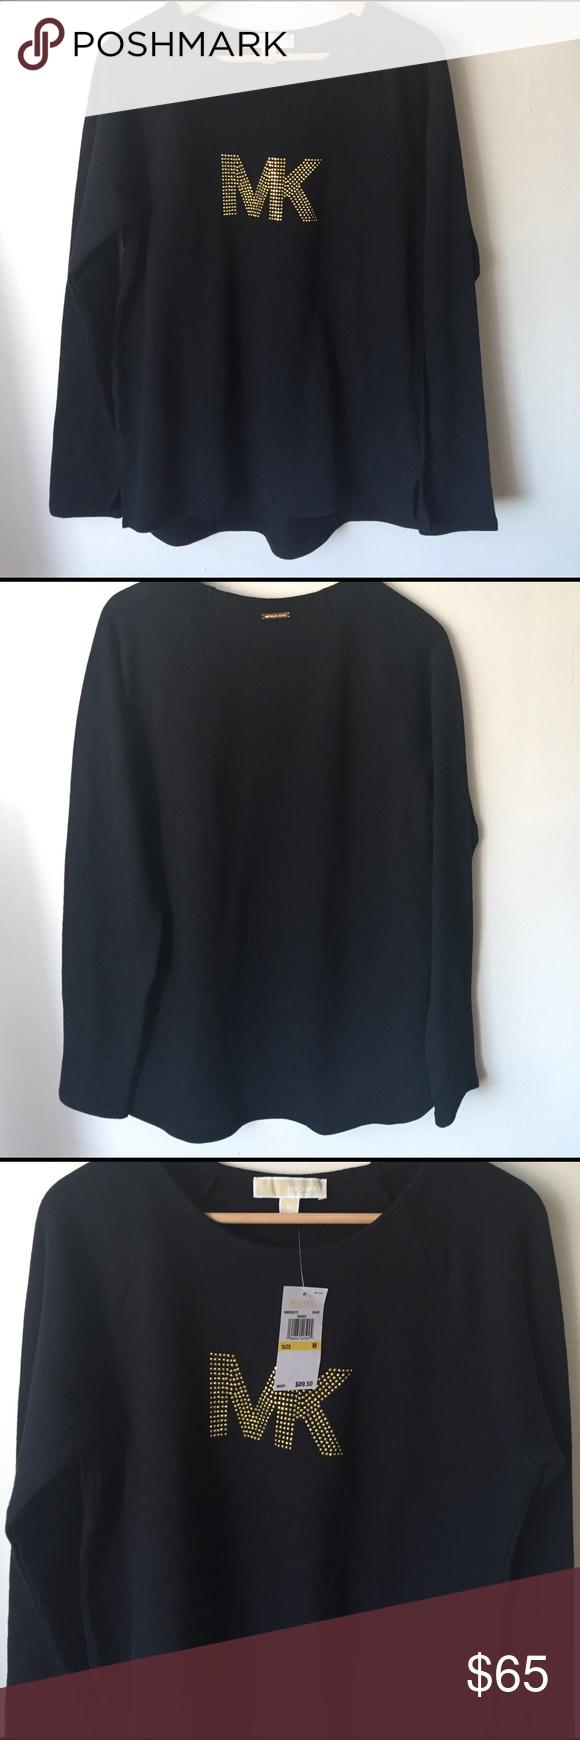 NWT Michael Kors Sweater Brand NWT Black Michael Kors Sweater. Slight high low. MICHAEL Michael Kors Sweaters